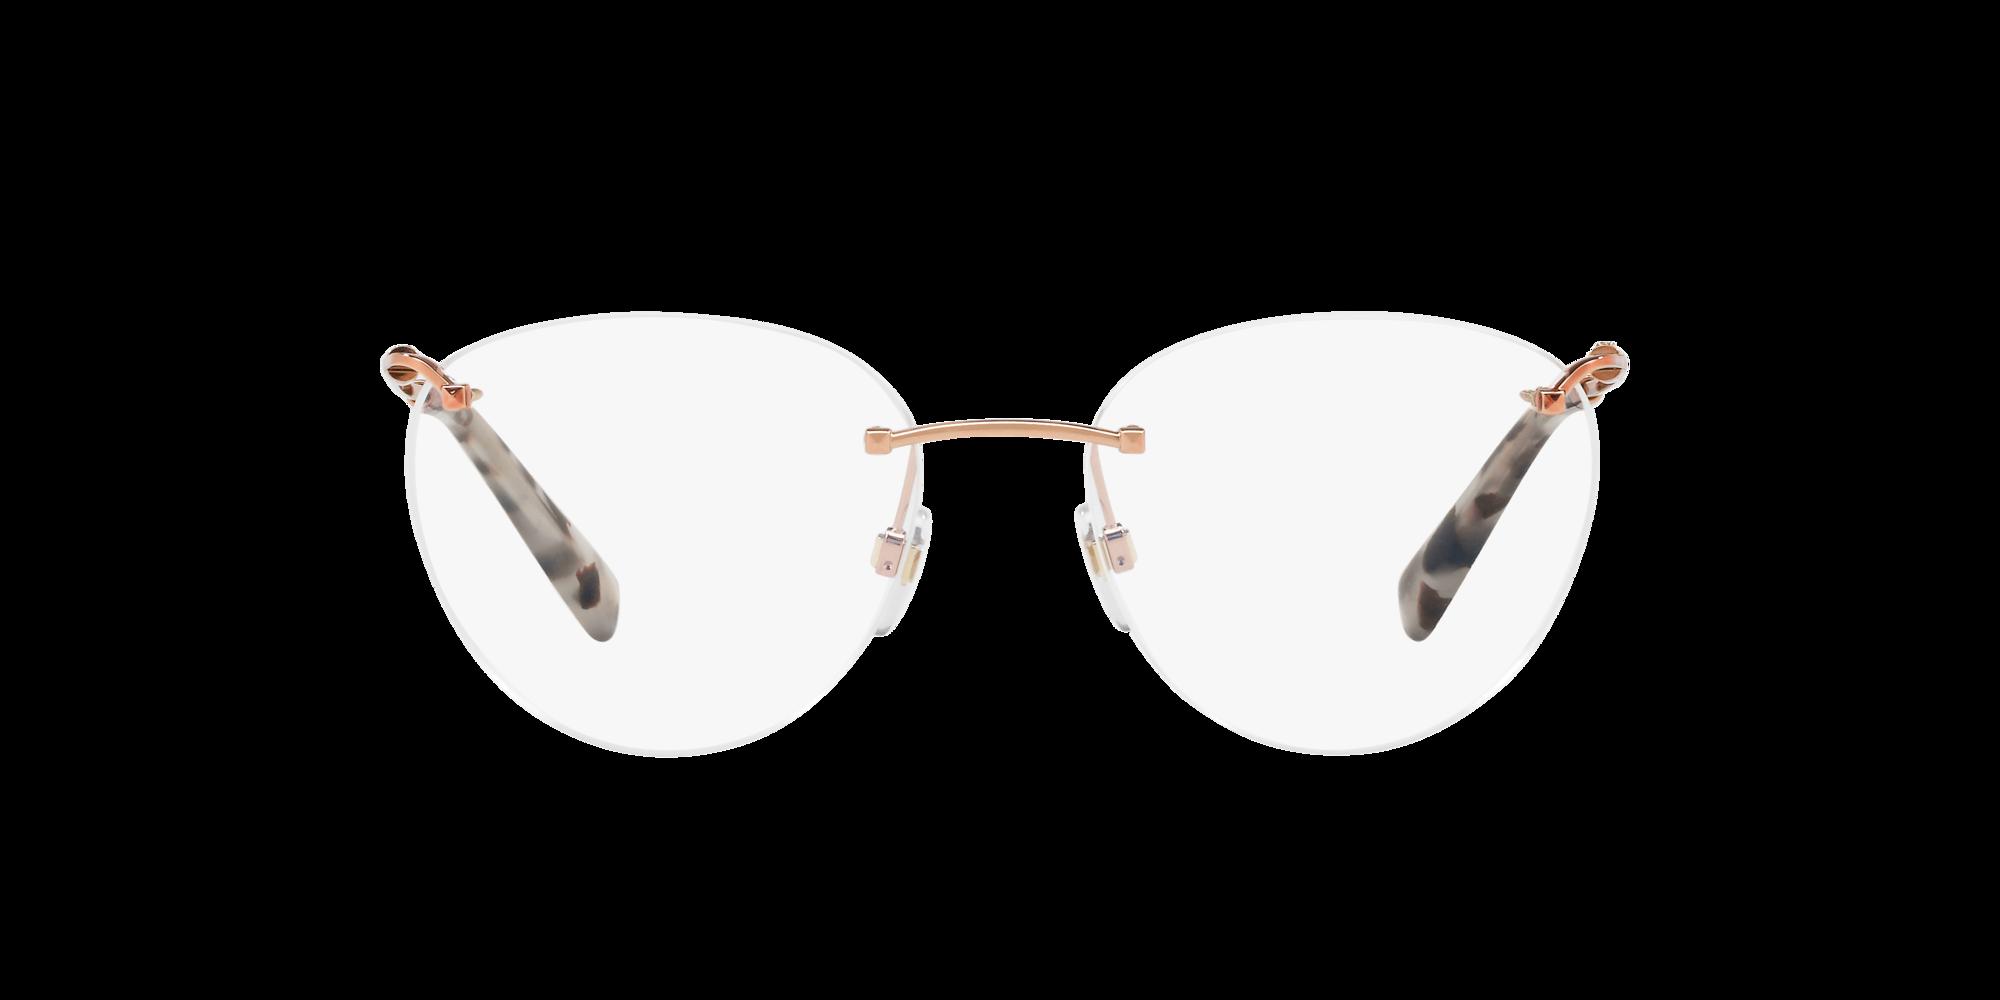 Image for VA1008 from LensCrafters | Glasses, Prescription Glasses Online, Eyewear